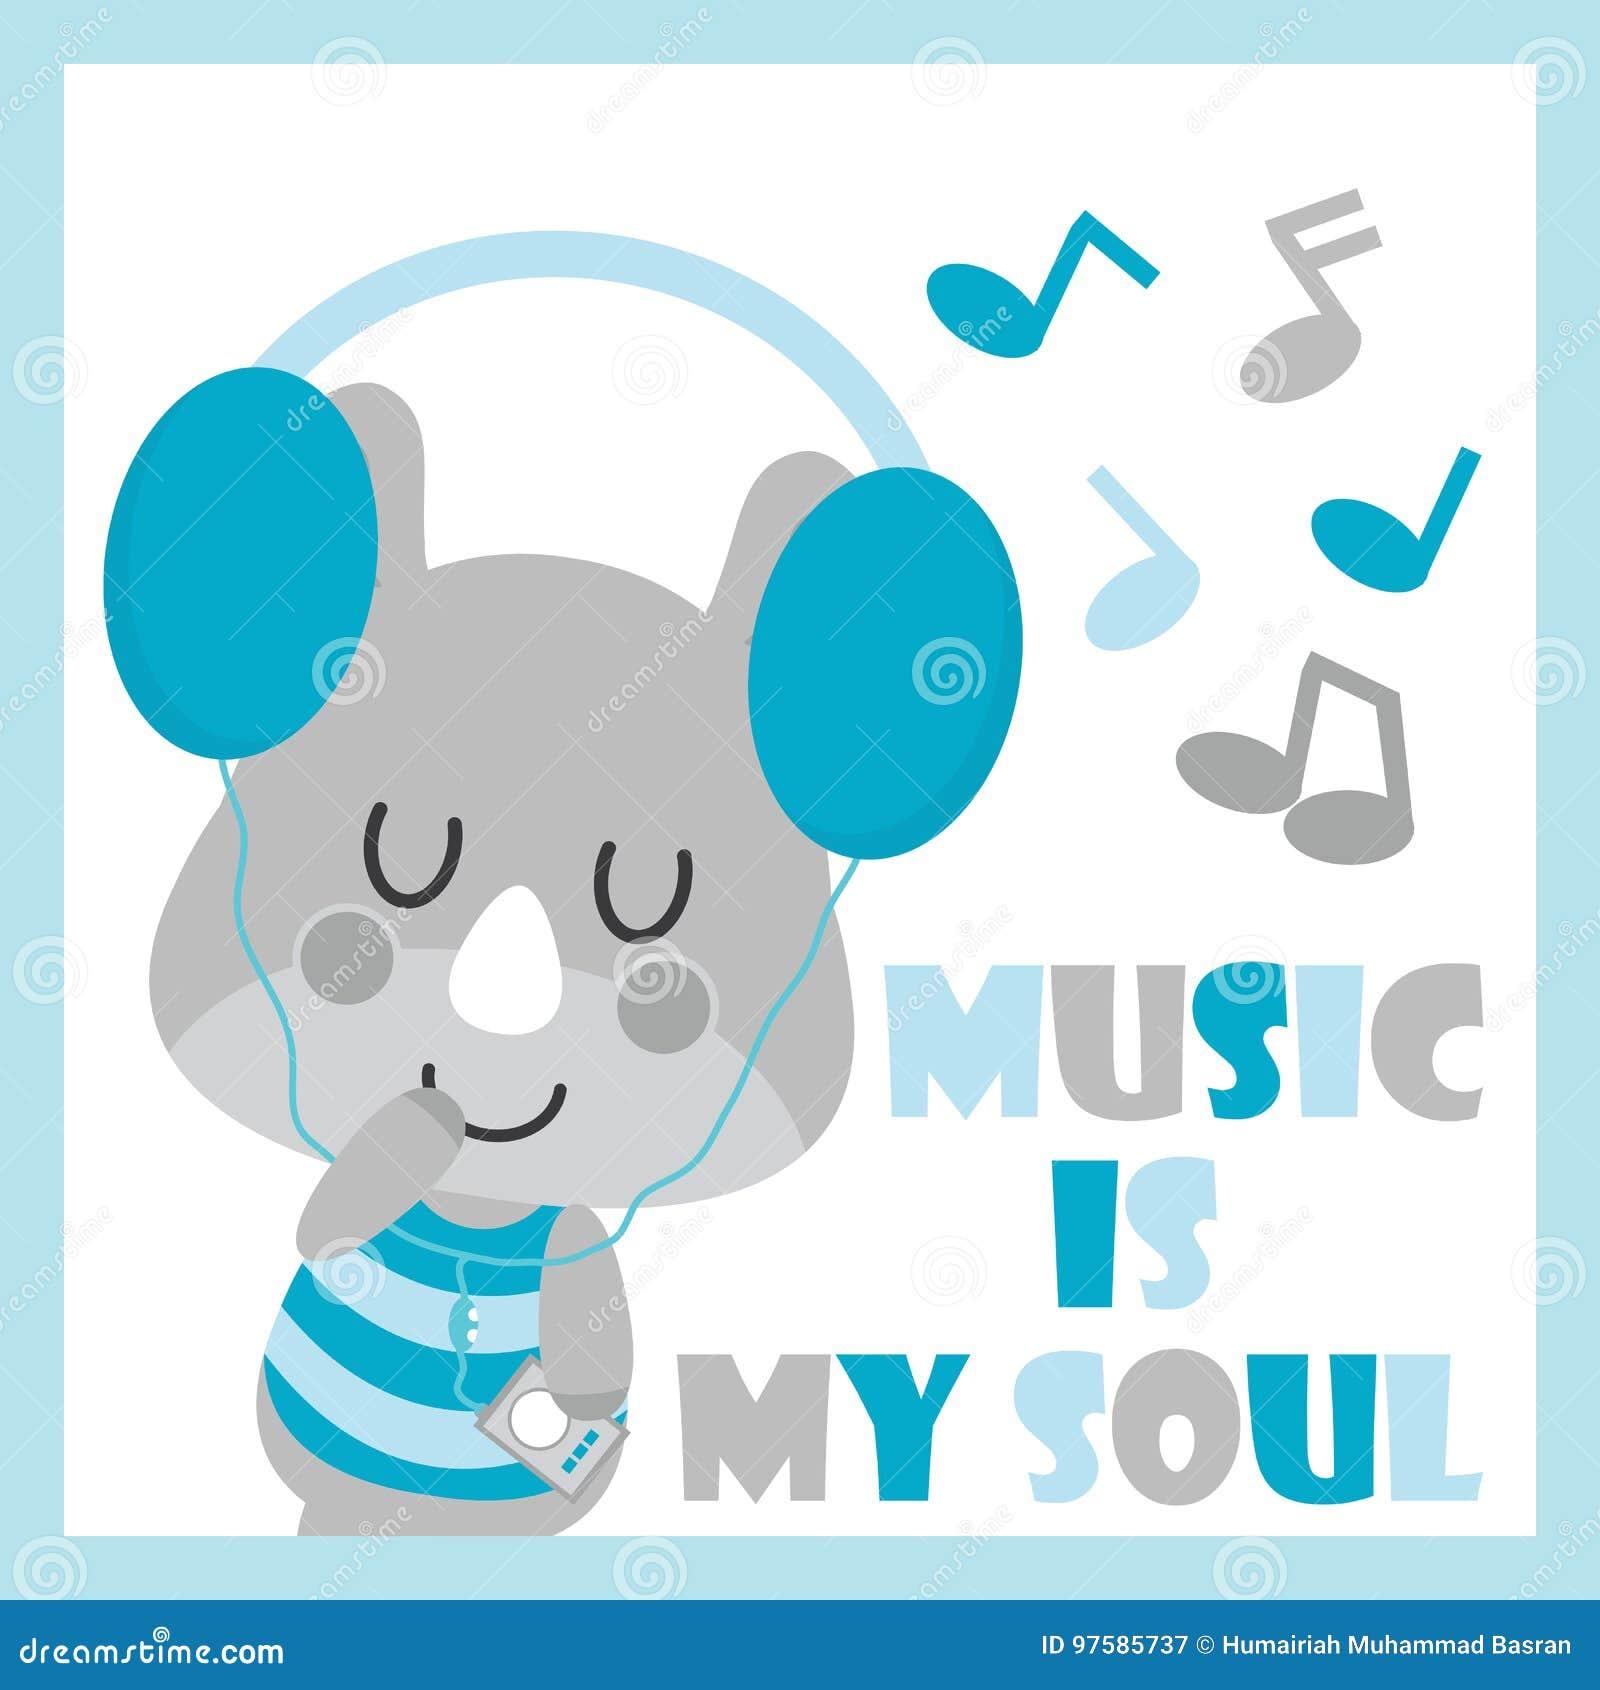 Cute Baby Rhino Is Listening Music Cartoon Illustration For Baby